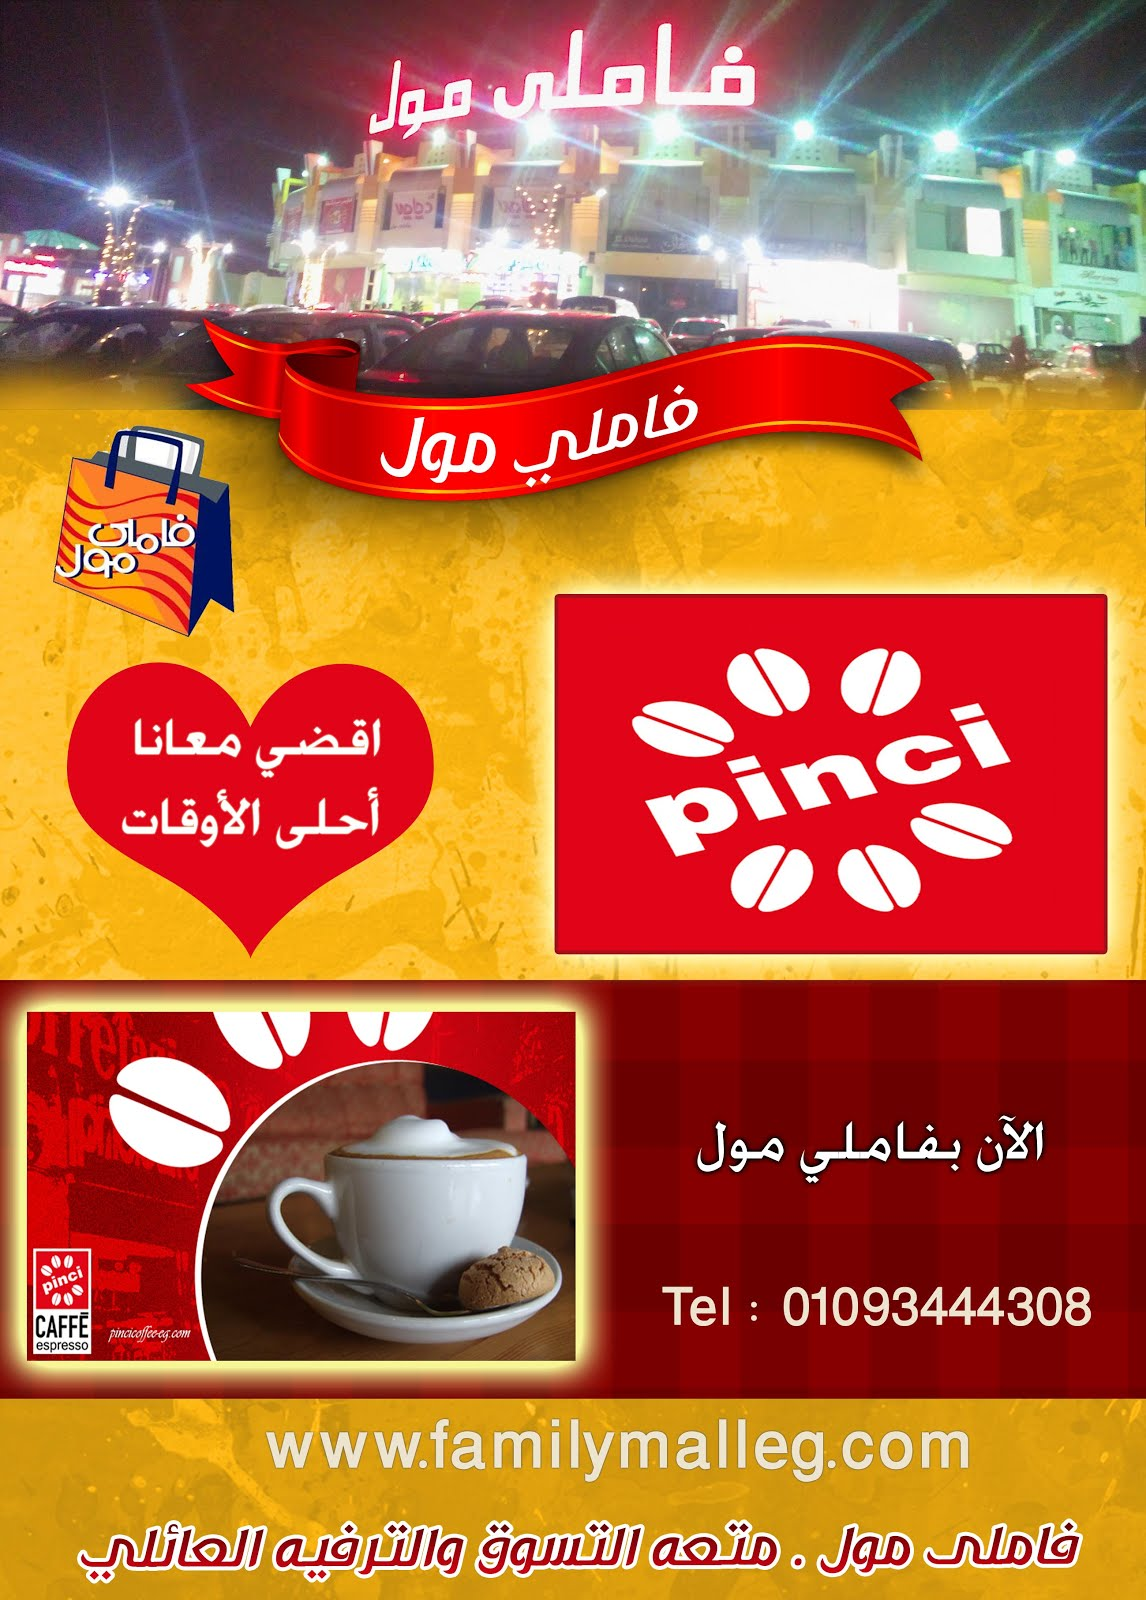 Pinci Cafe بينشي كافيه